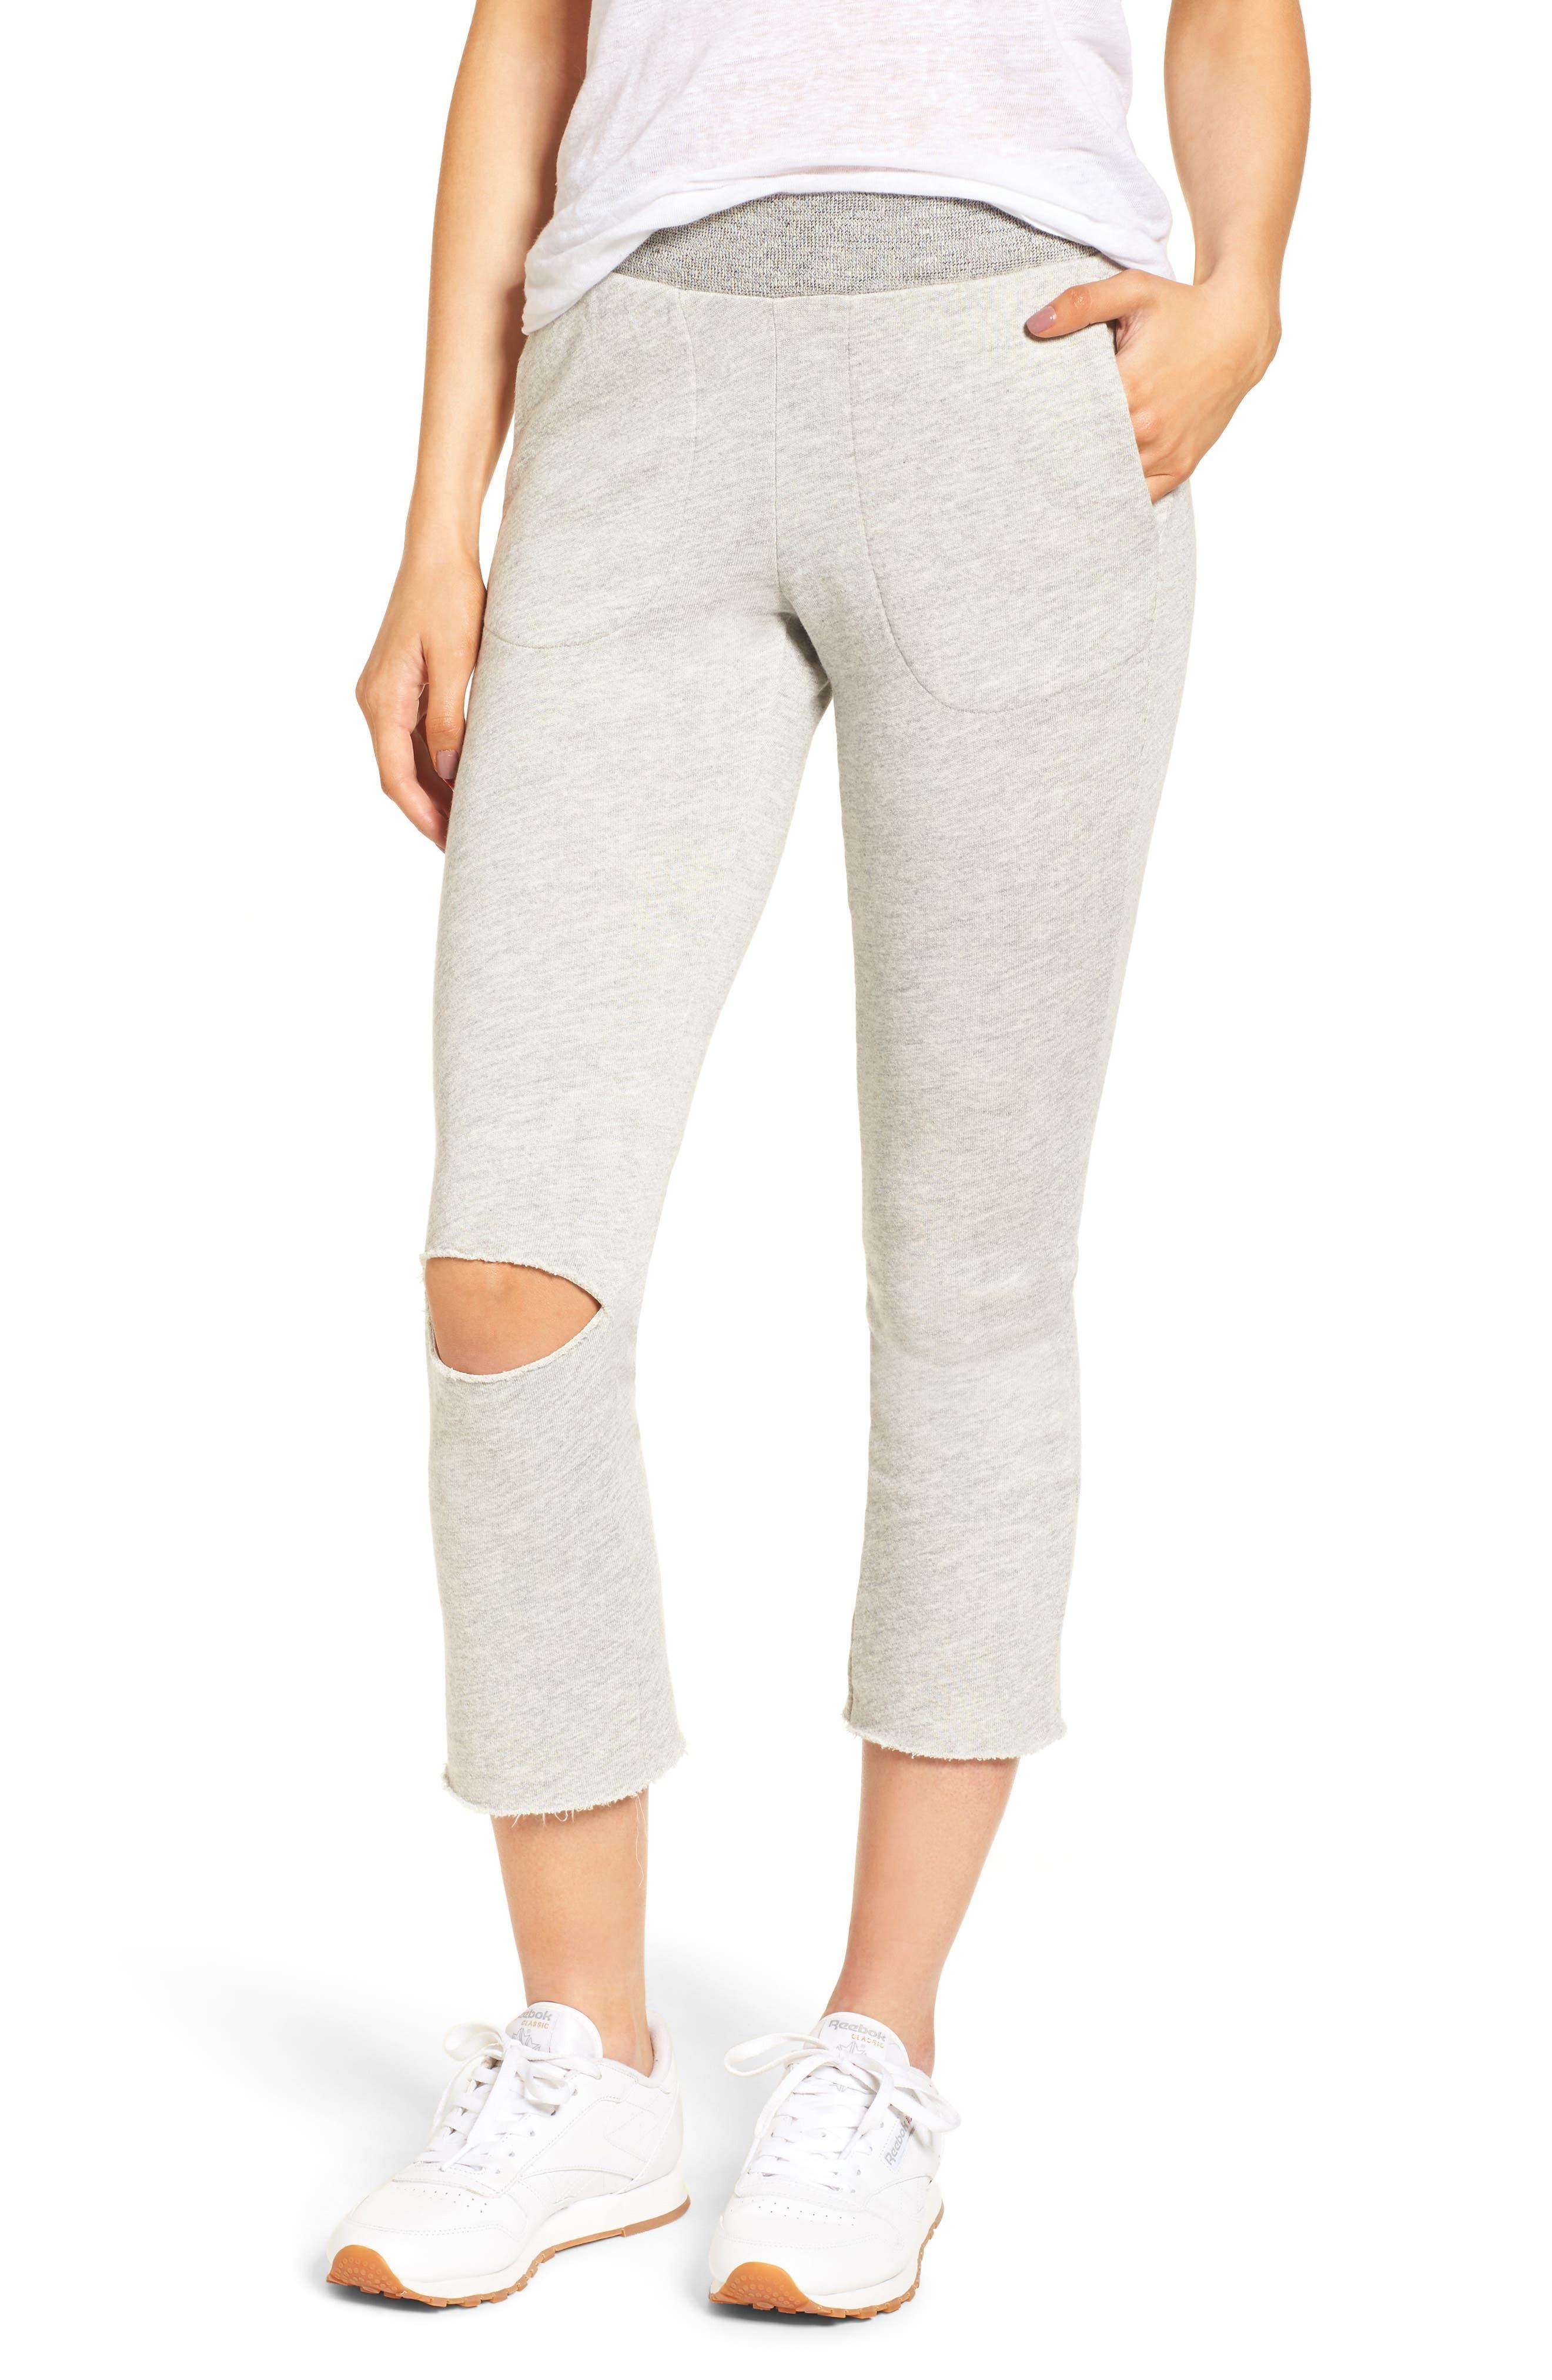 Malibu Slit Knee Sweatpants,                         Main,                         color, Heather Grey